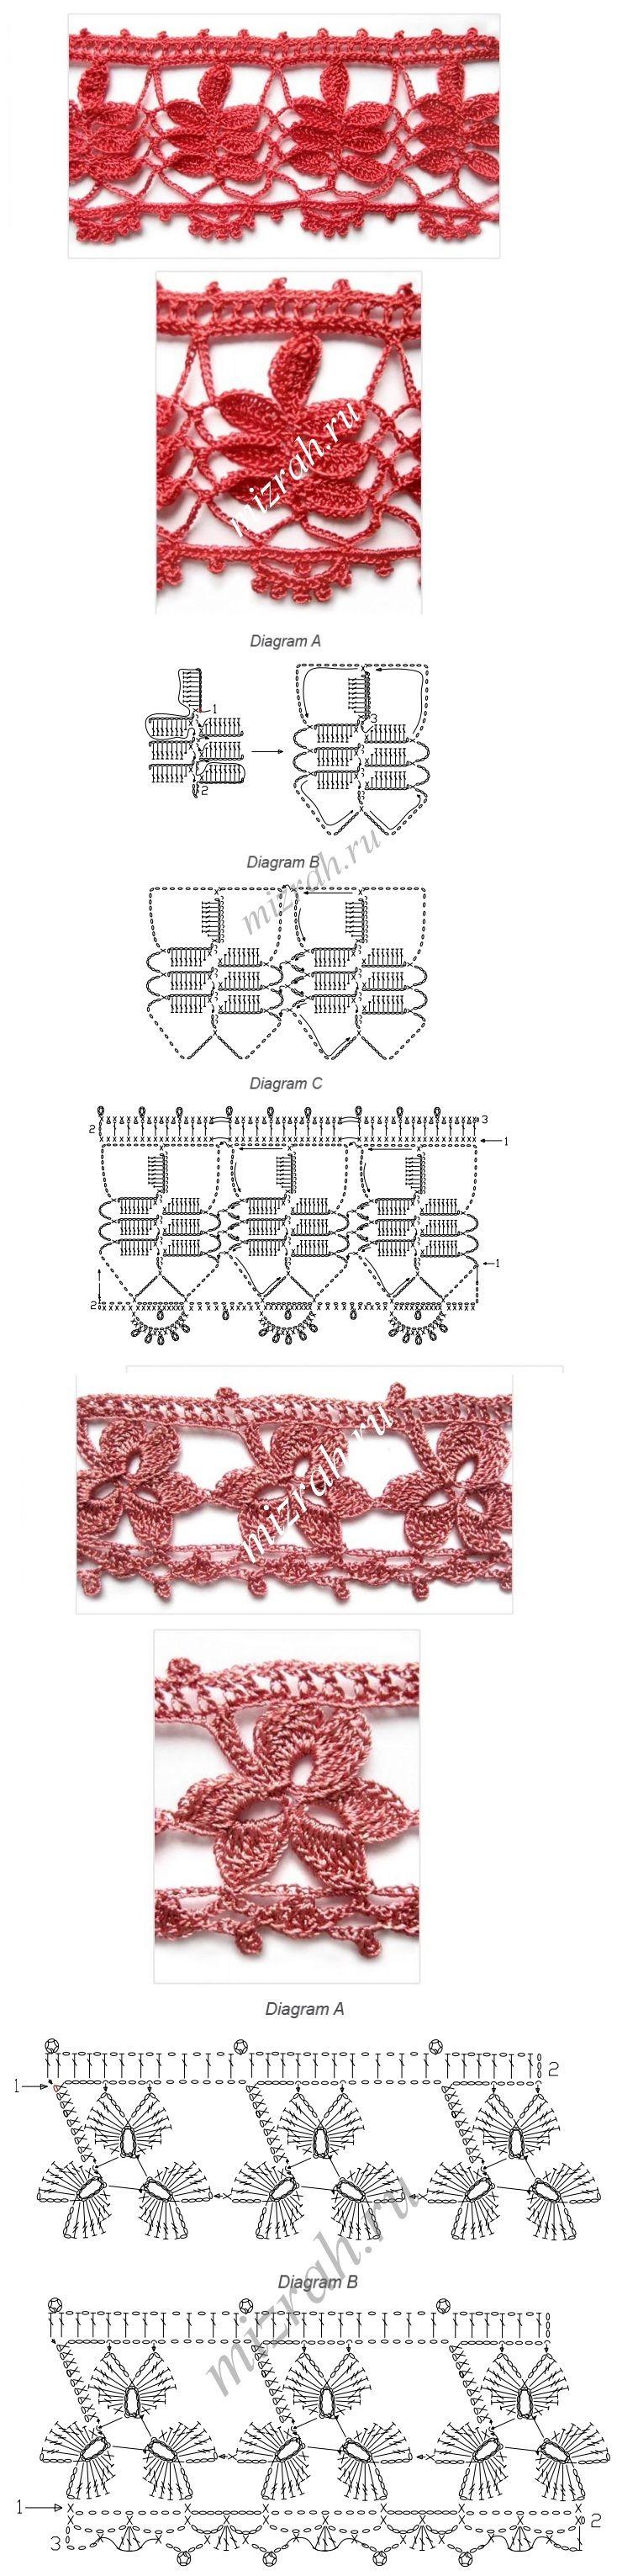 Цветы для каймы крючком схемы